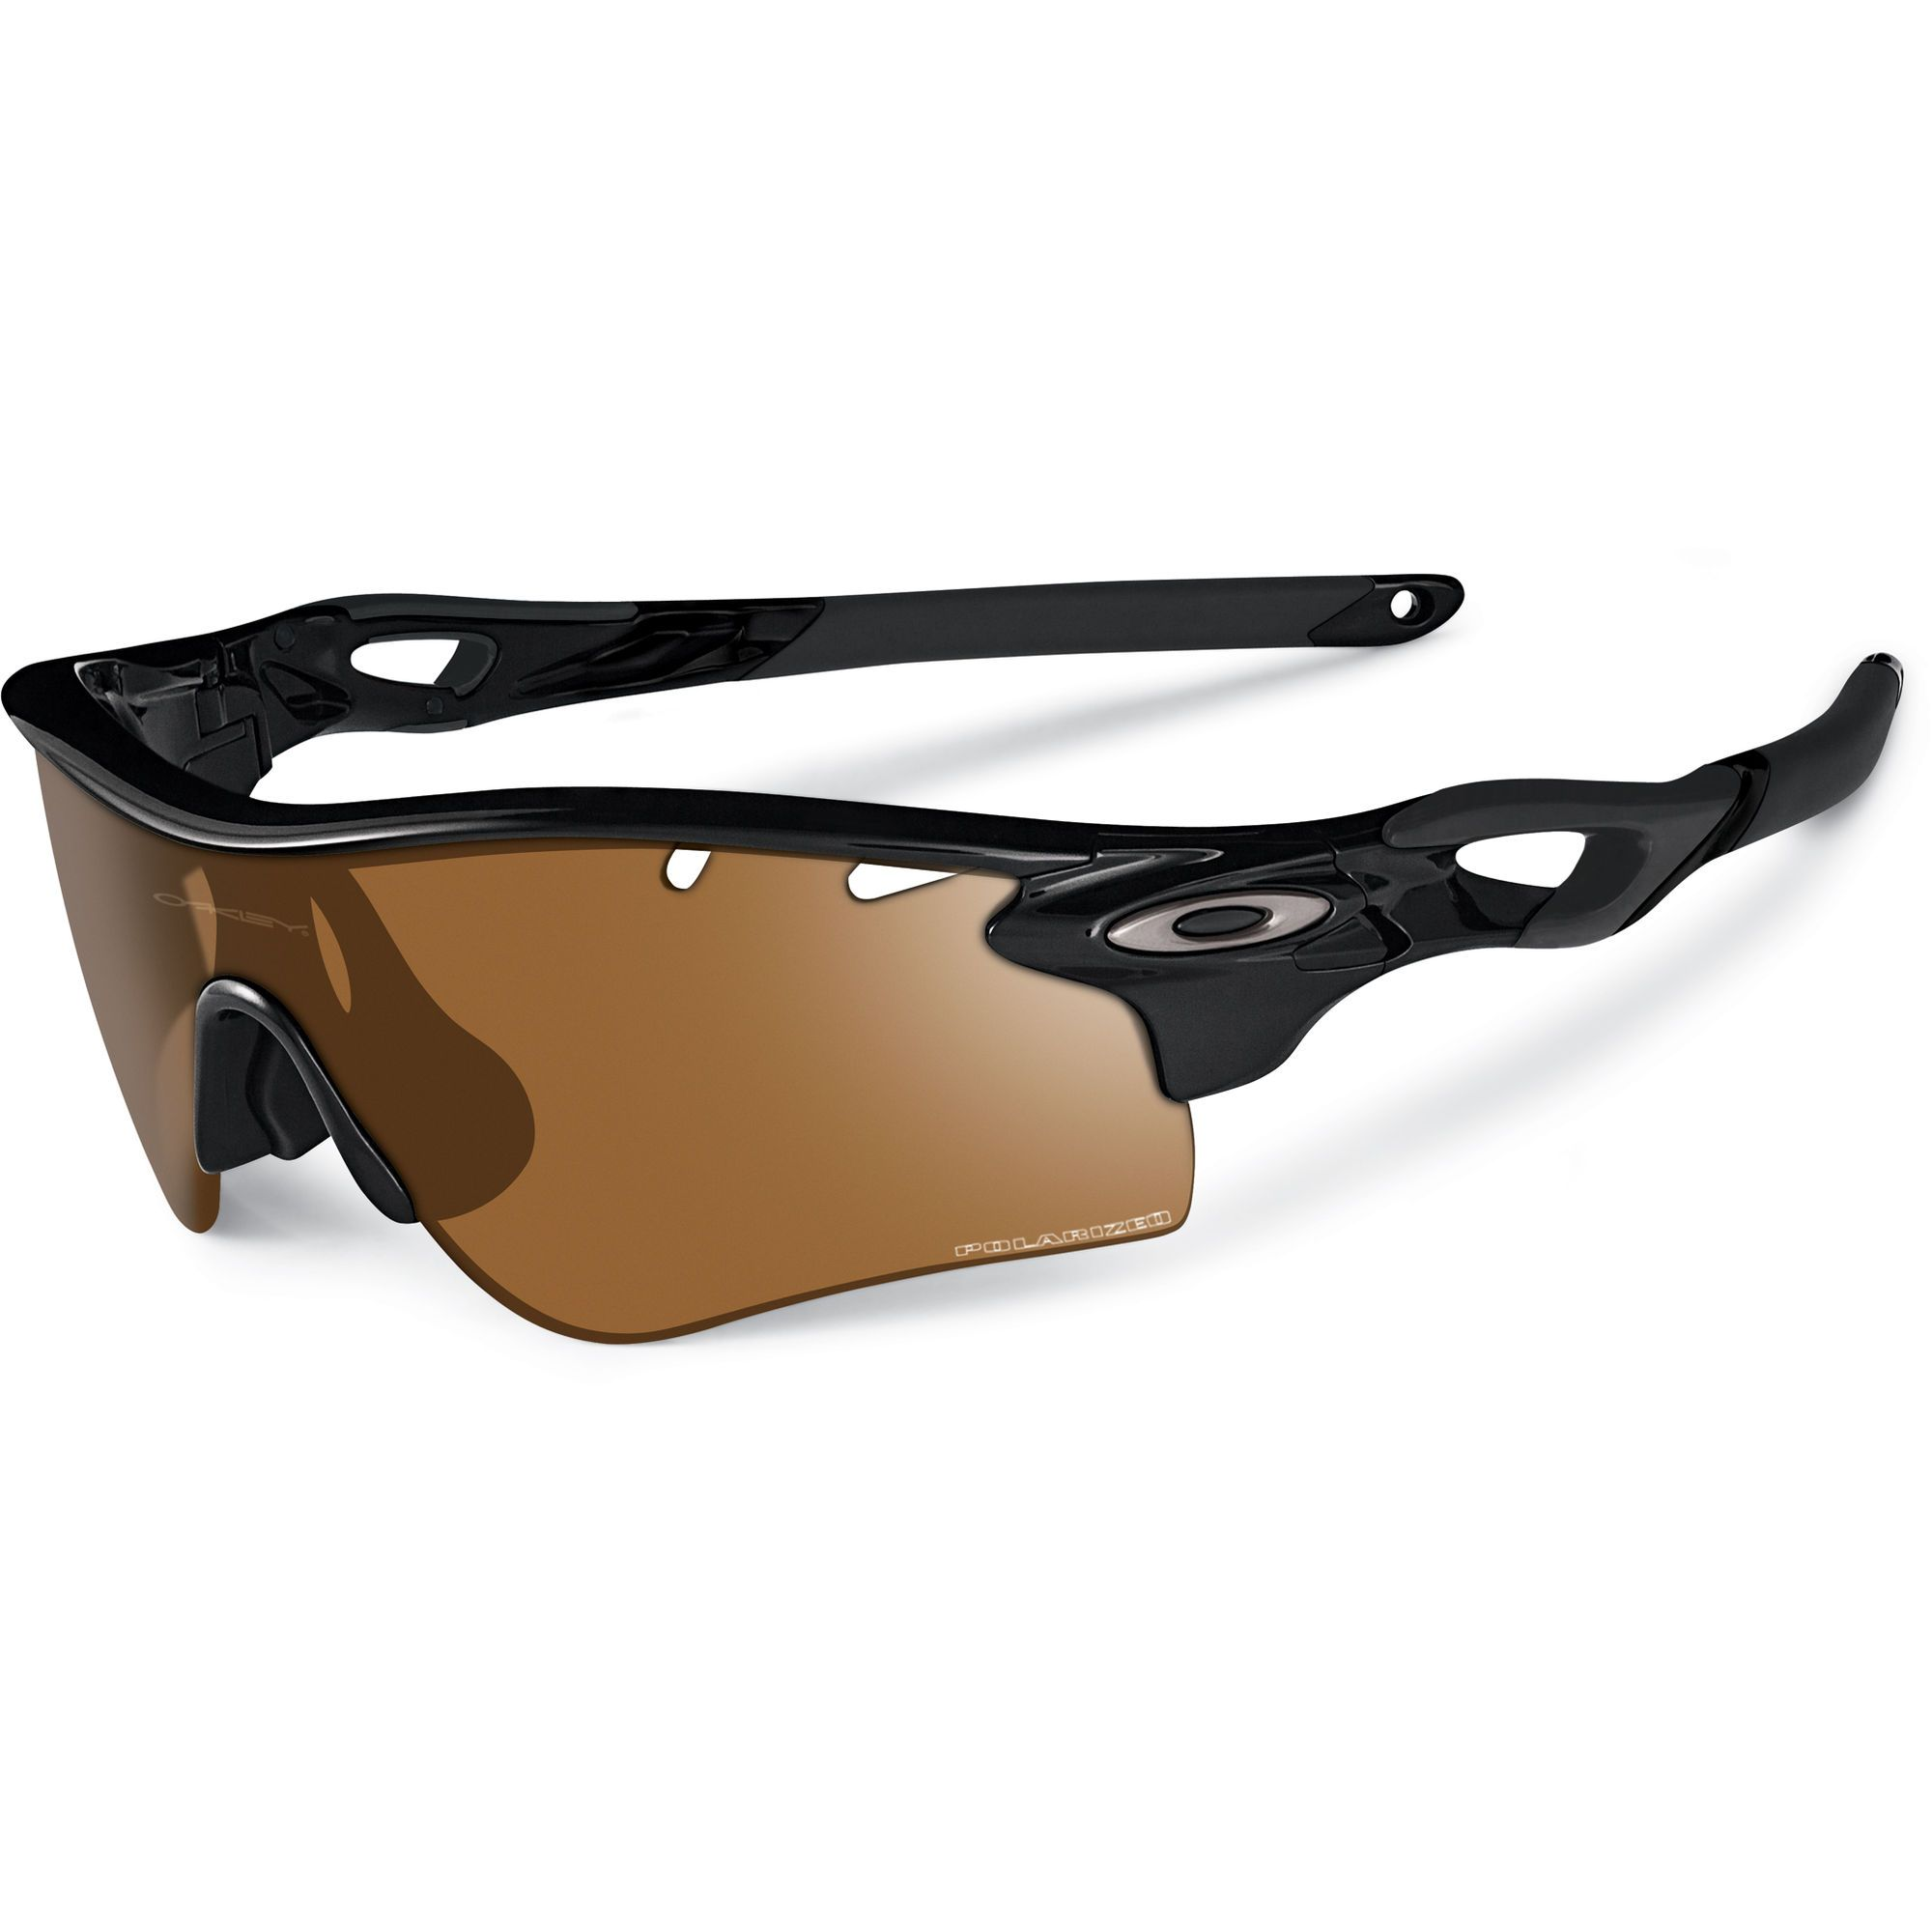 Wiggle Oakley Radarlock Path Polarized Vented Sunglasses